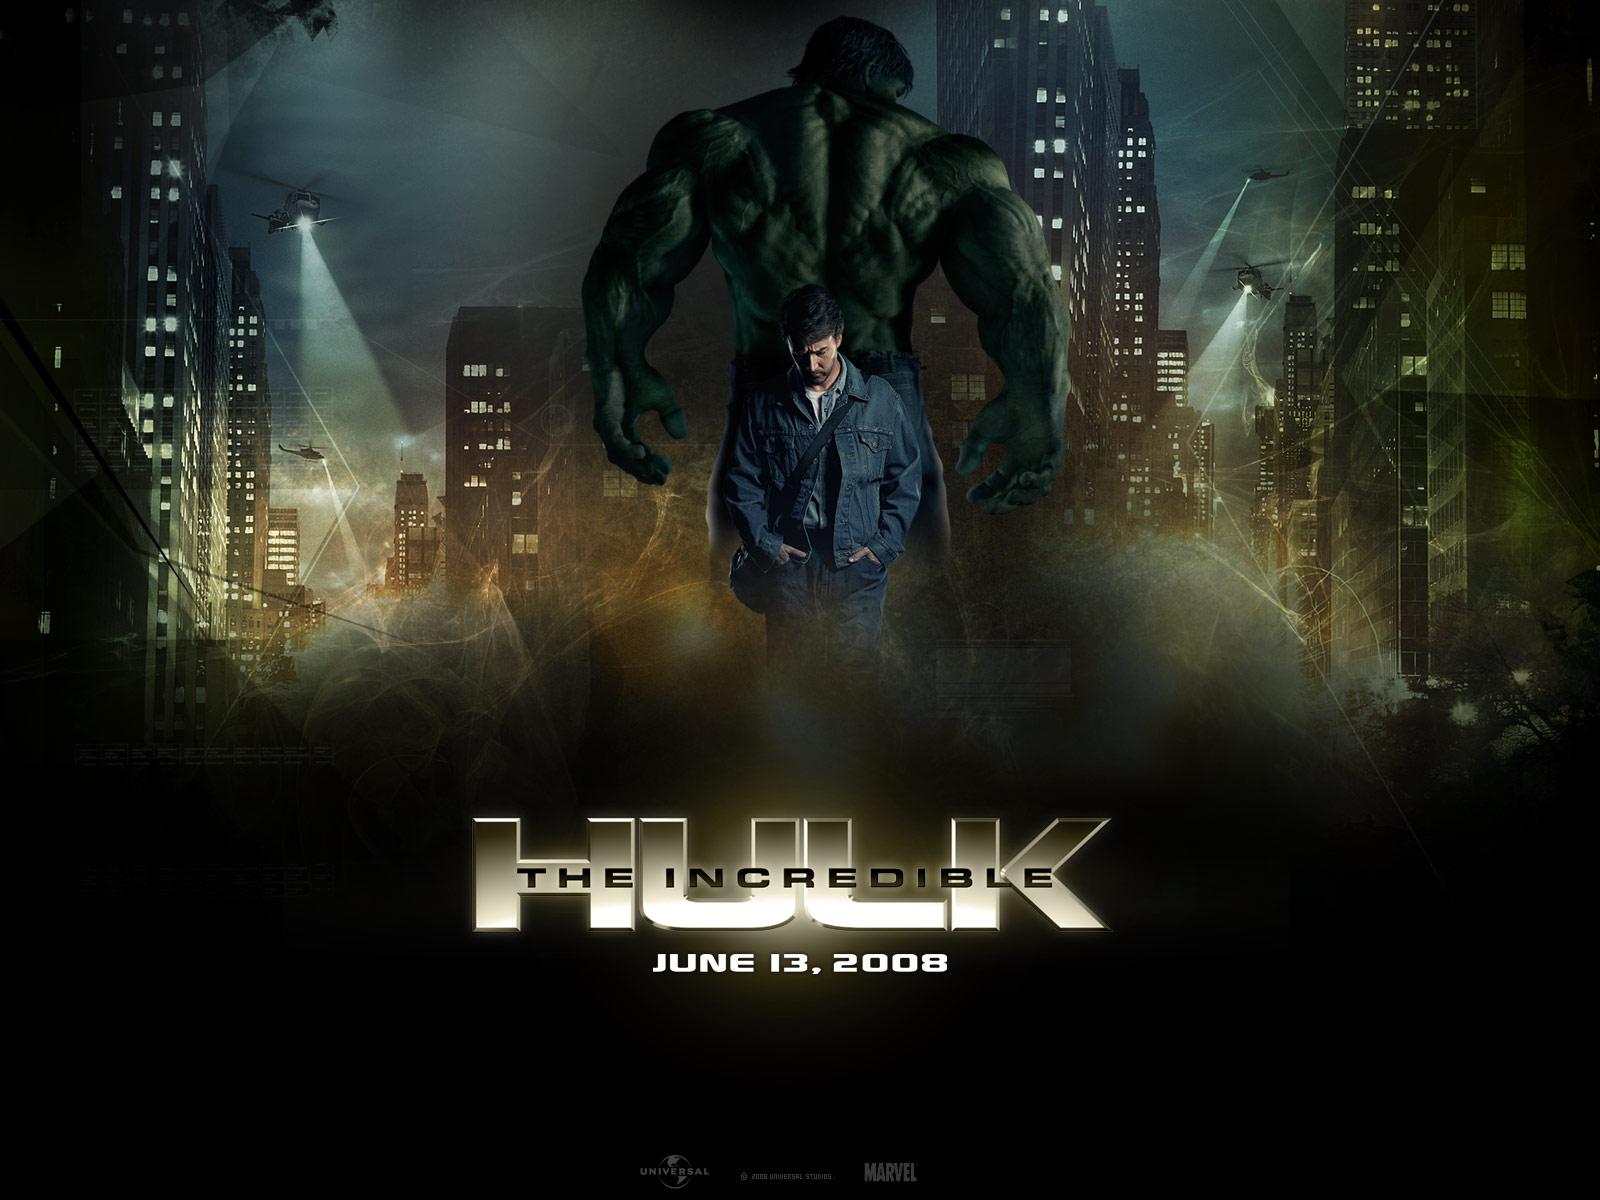 http://4.bp.blogspot.com/-Yq7ghXFfcT8/TrHF6nMWX4I/AAAAAAAAAKo/uRBQ3v6WSMY/s1600/Edward_Norton_in_The_Incredible_Hulk_Wallpaper_8_800.jpg